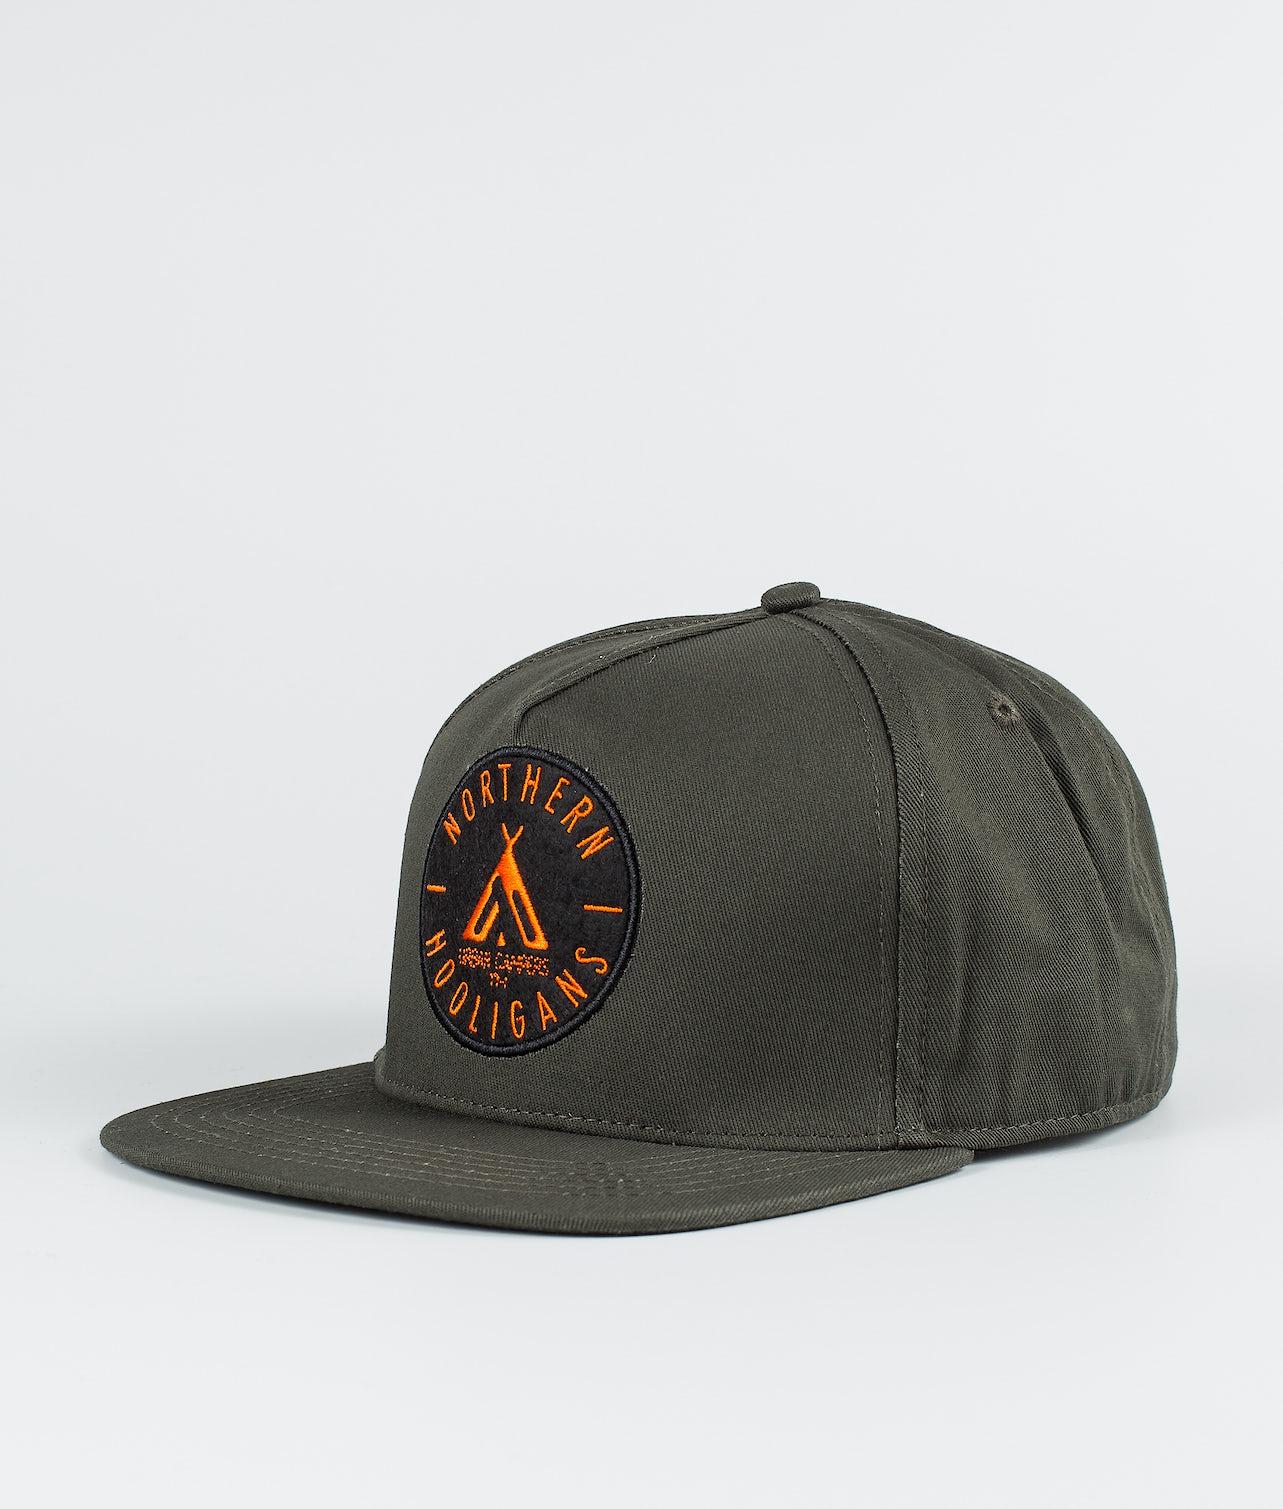 Northern Hooligans Urban Campers Snapback Caps Woods Green